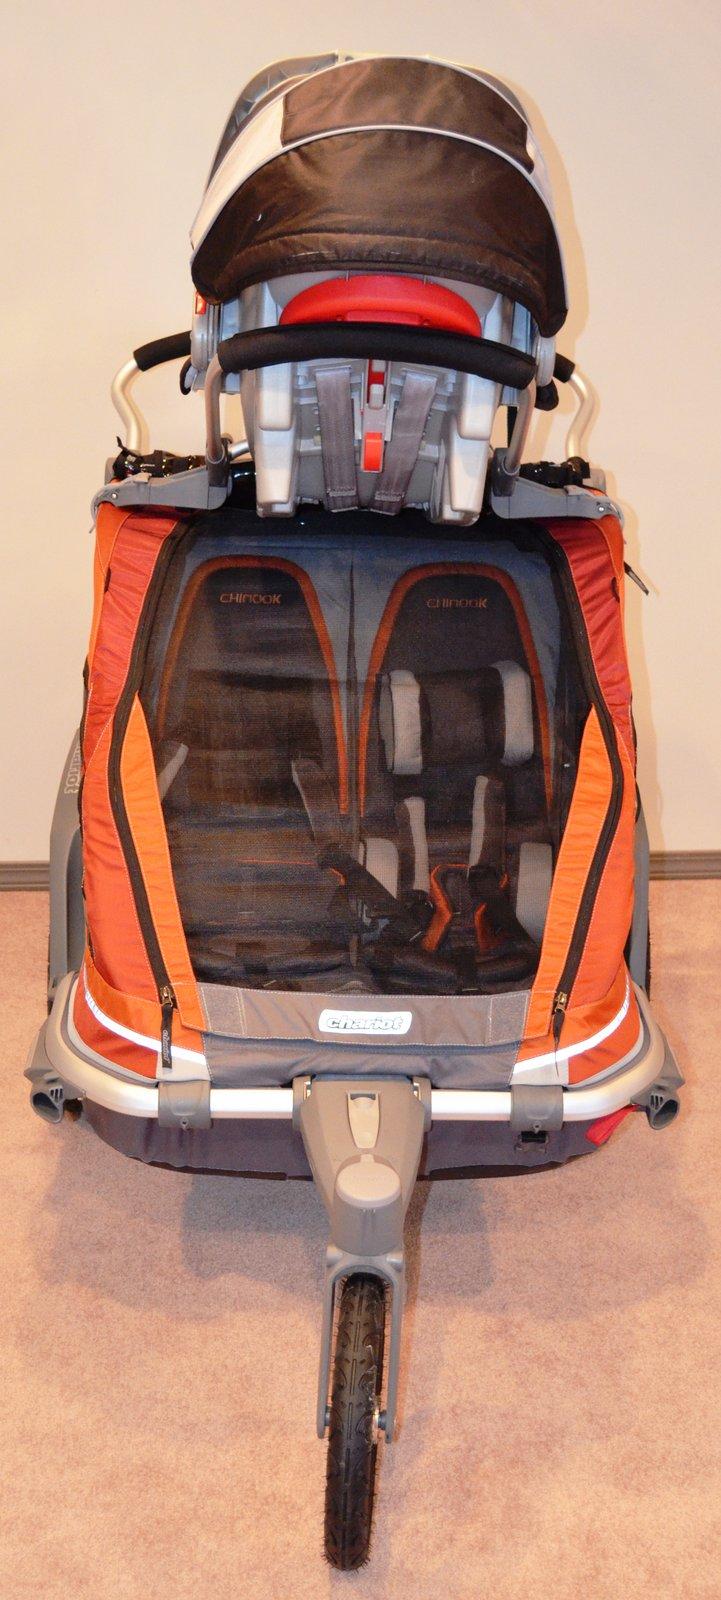 Chariot Chinook 2 Chariot Chinook 2 Amp Car Seat Adaptor